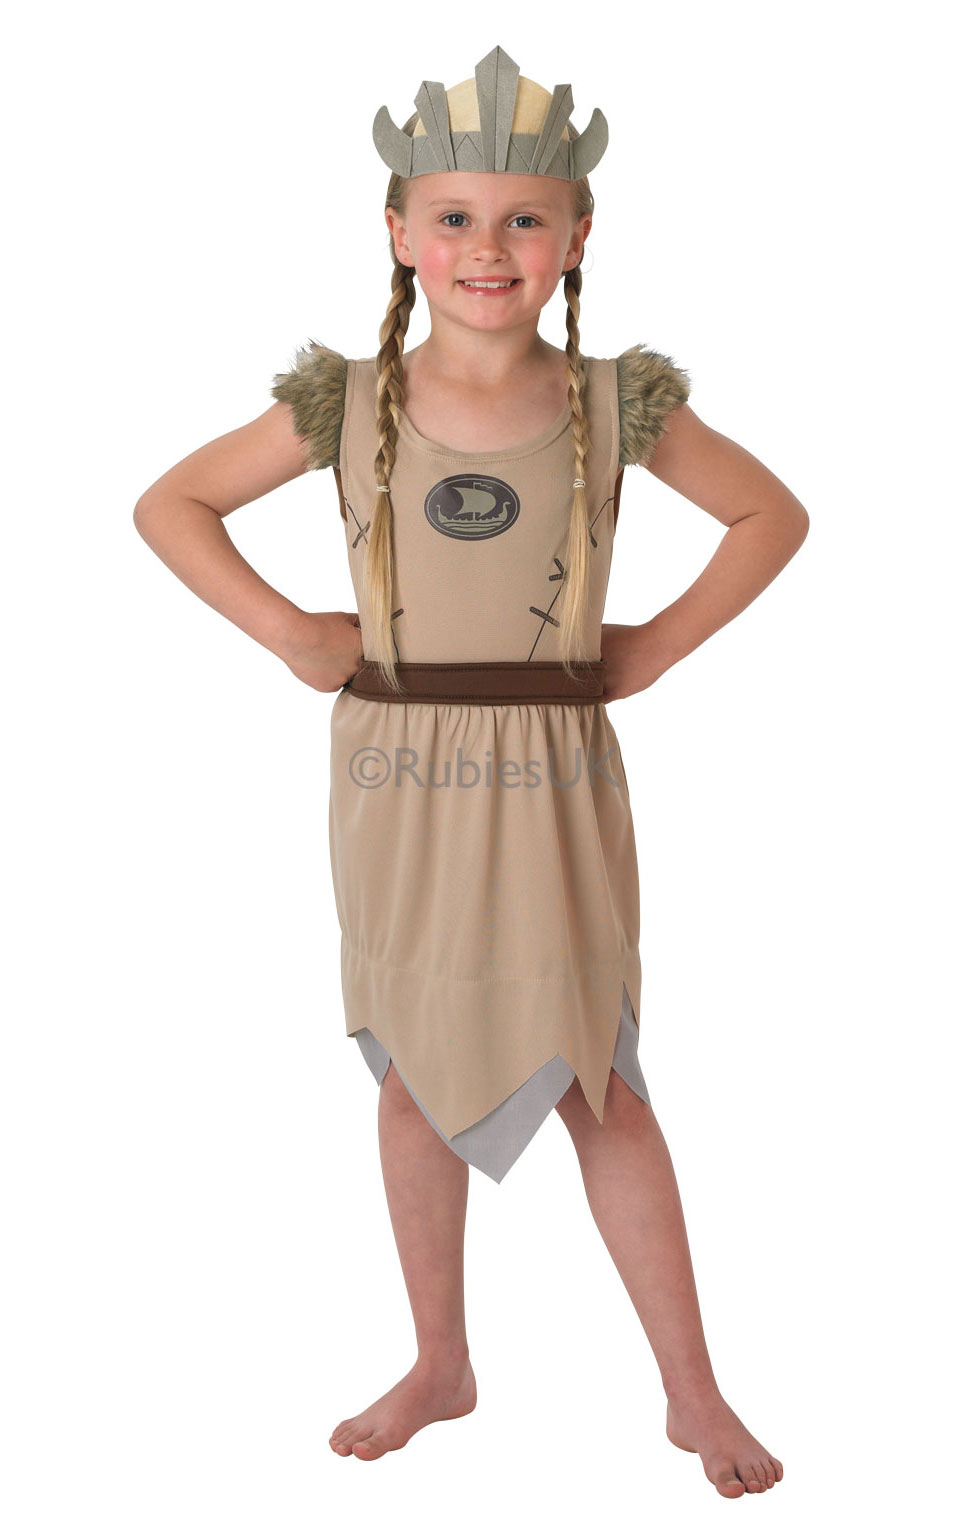 Brilliant  Saxon Viking Fancy Dress Costume  Complete Costumes Costume Hire